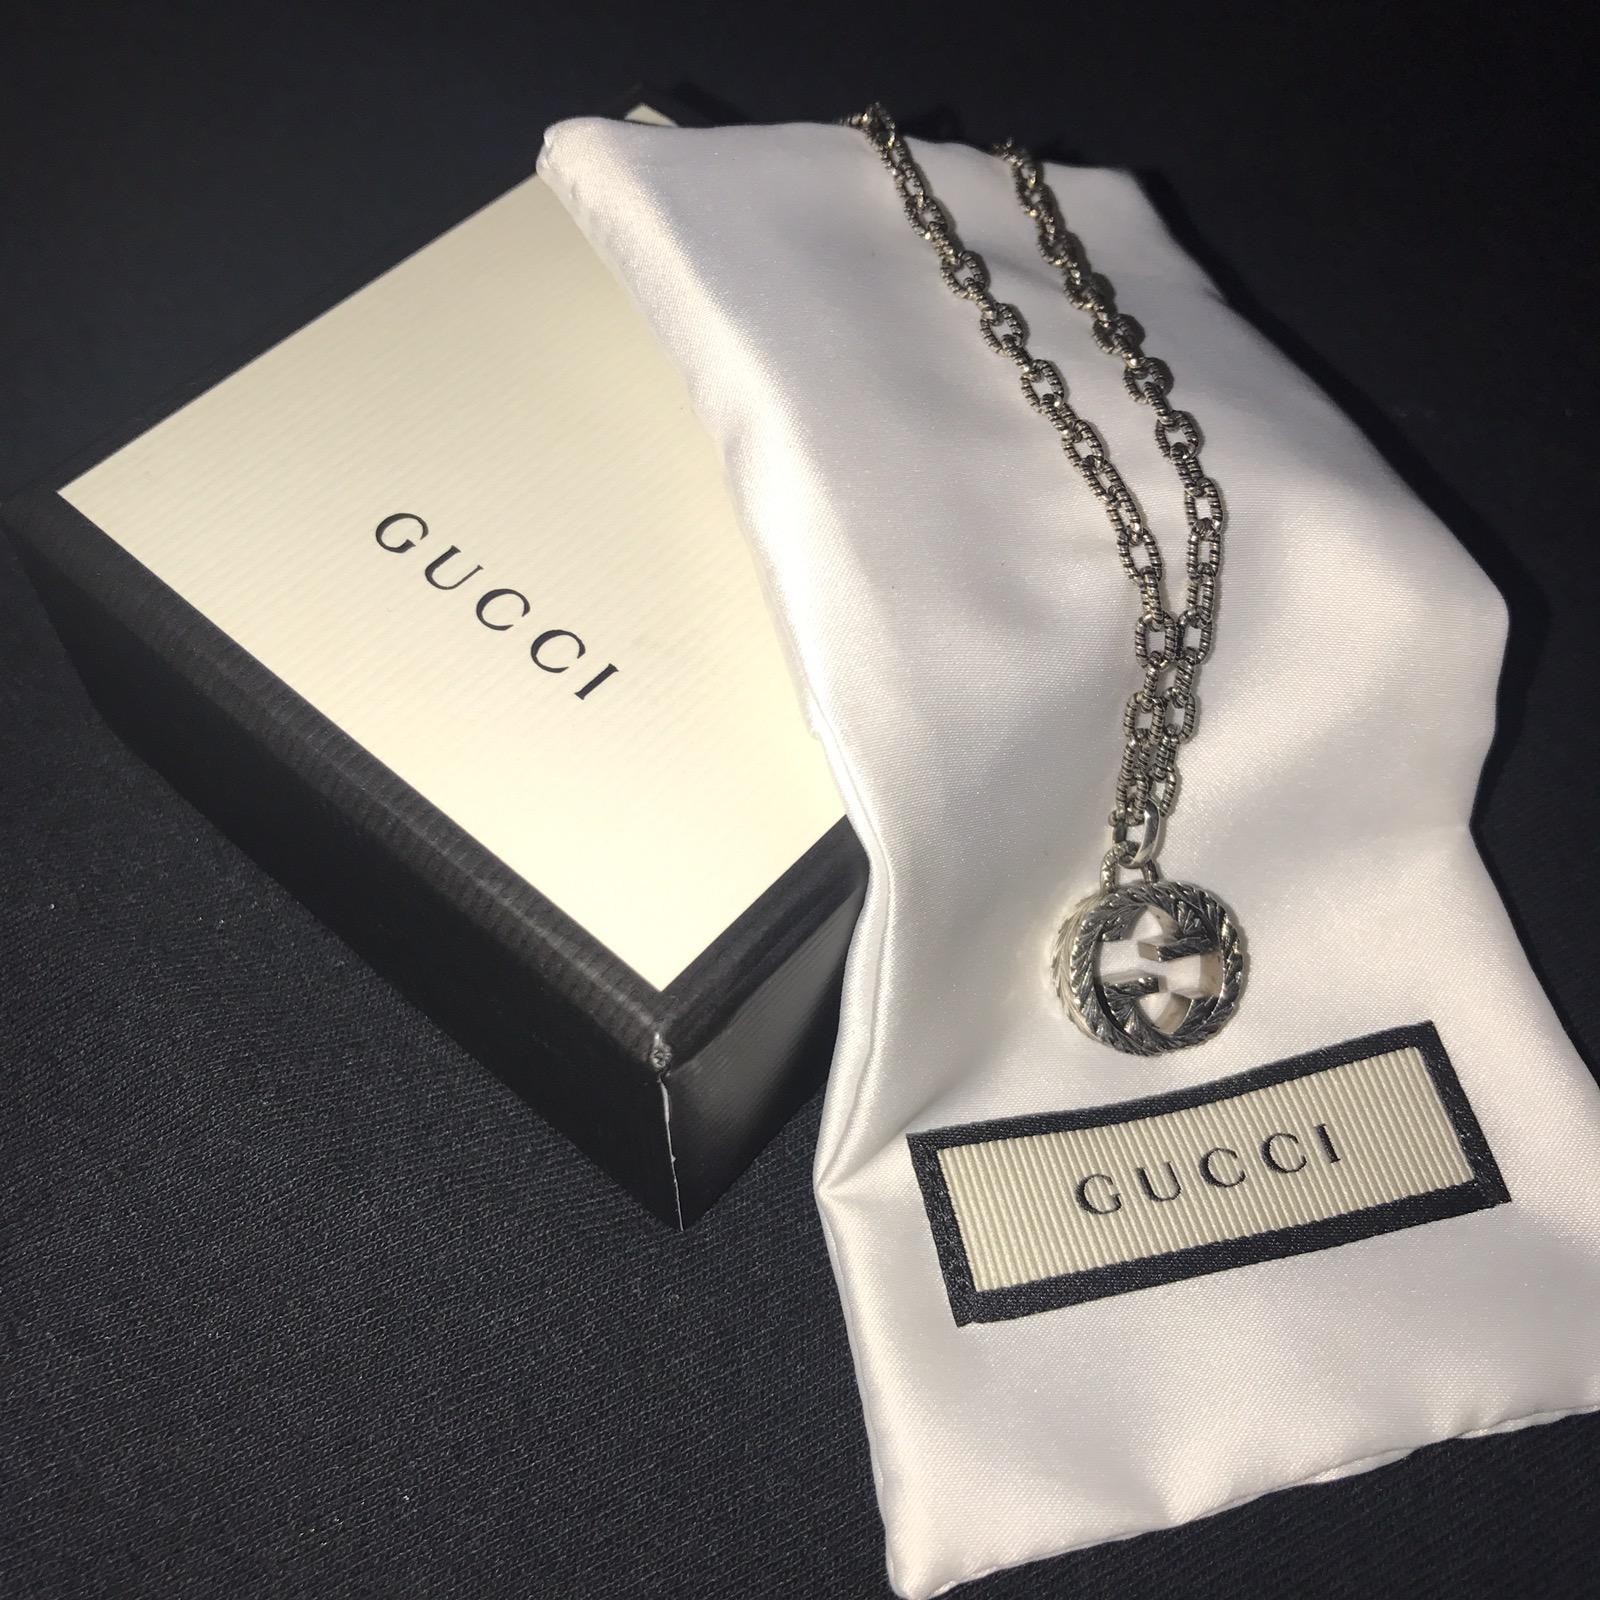 51ba51b0b Gucci Interlocking G Necklace In Silver | Grailed